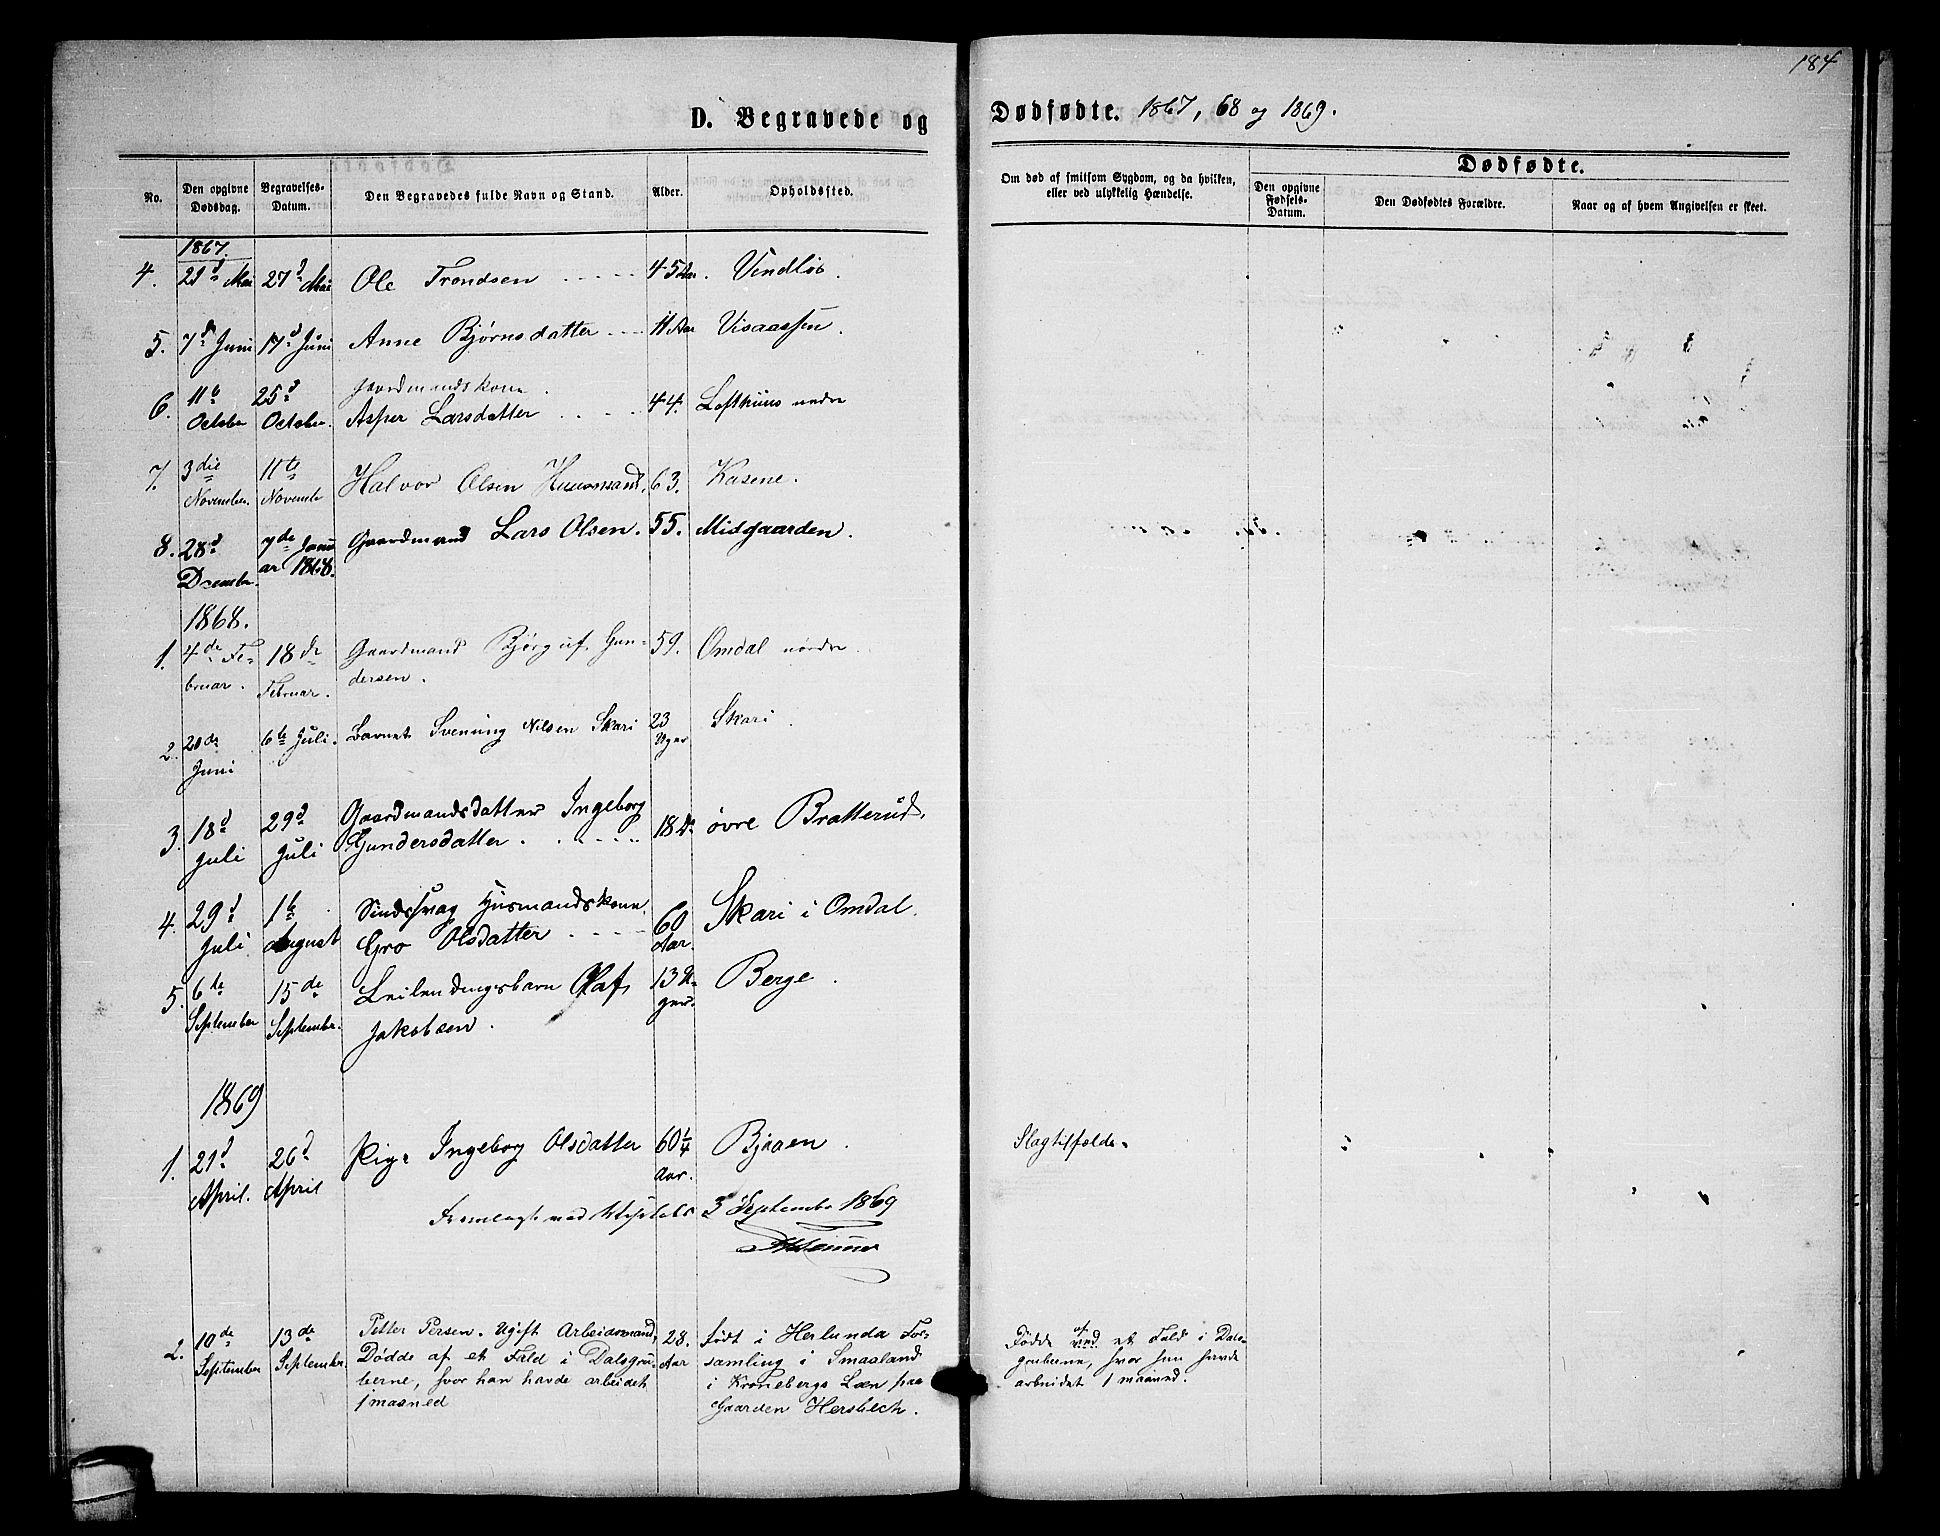 SAKO, Lårdal kirkebøker, G/Gb/L0002: Klokkerbok nr. II 2, 1865-1888, s. 184